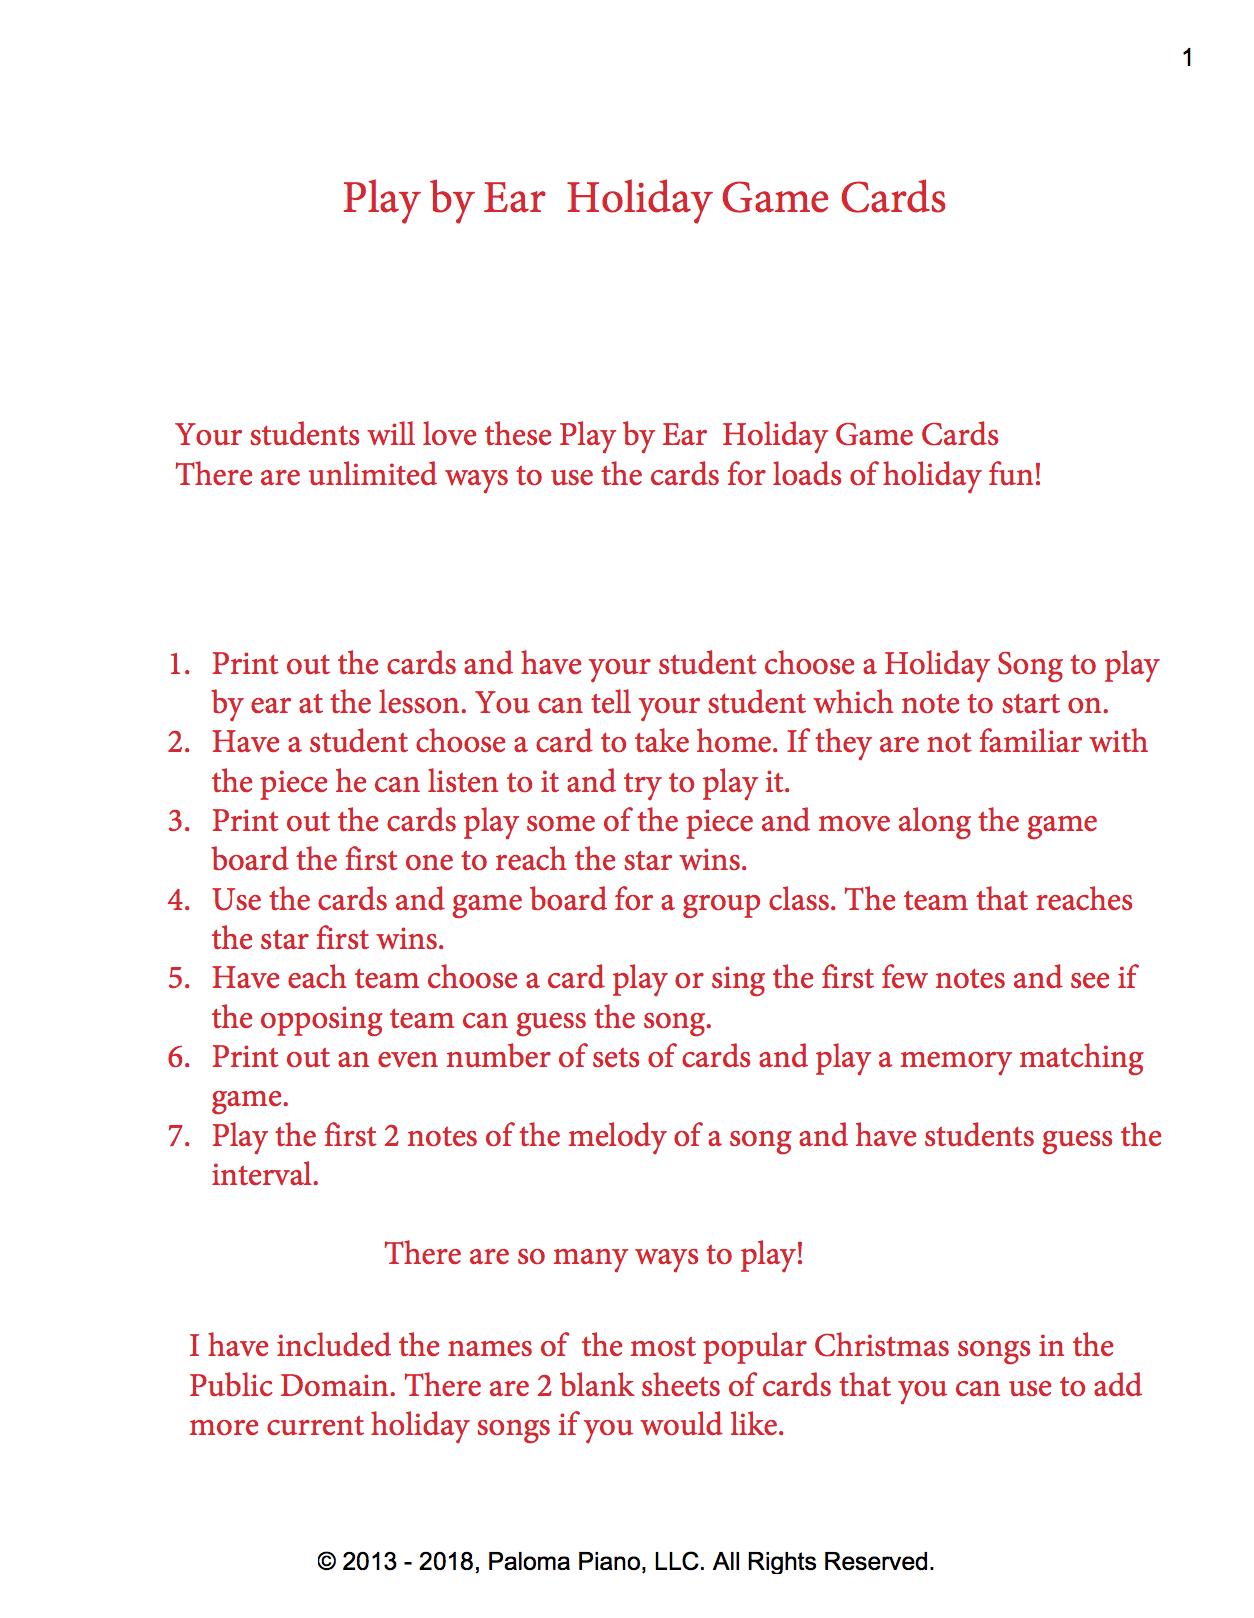 Paloma Piano - Play By Ear Holiday Card Game | Paloma Piano